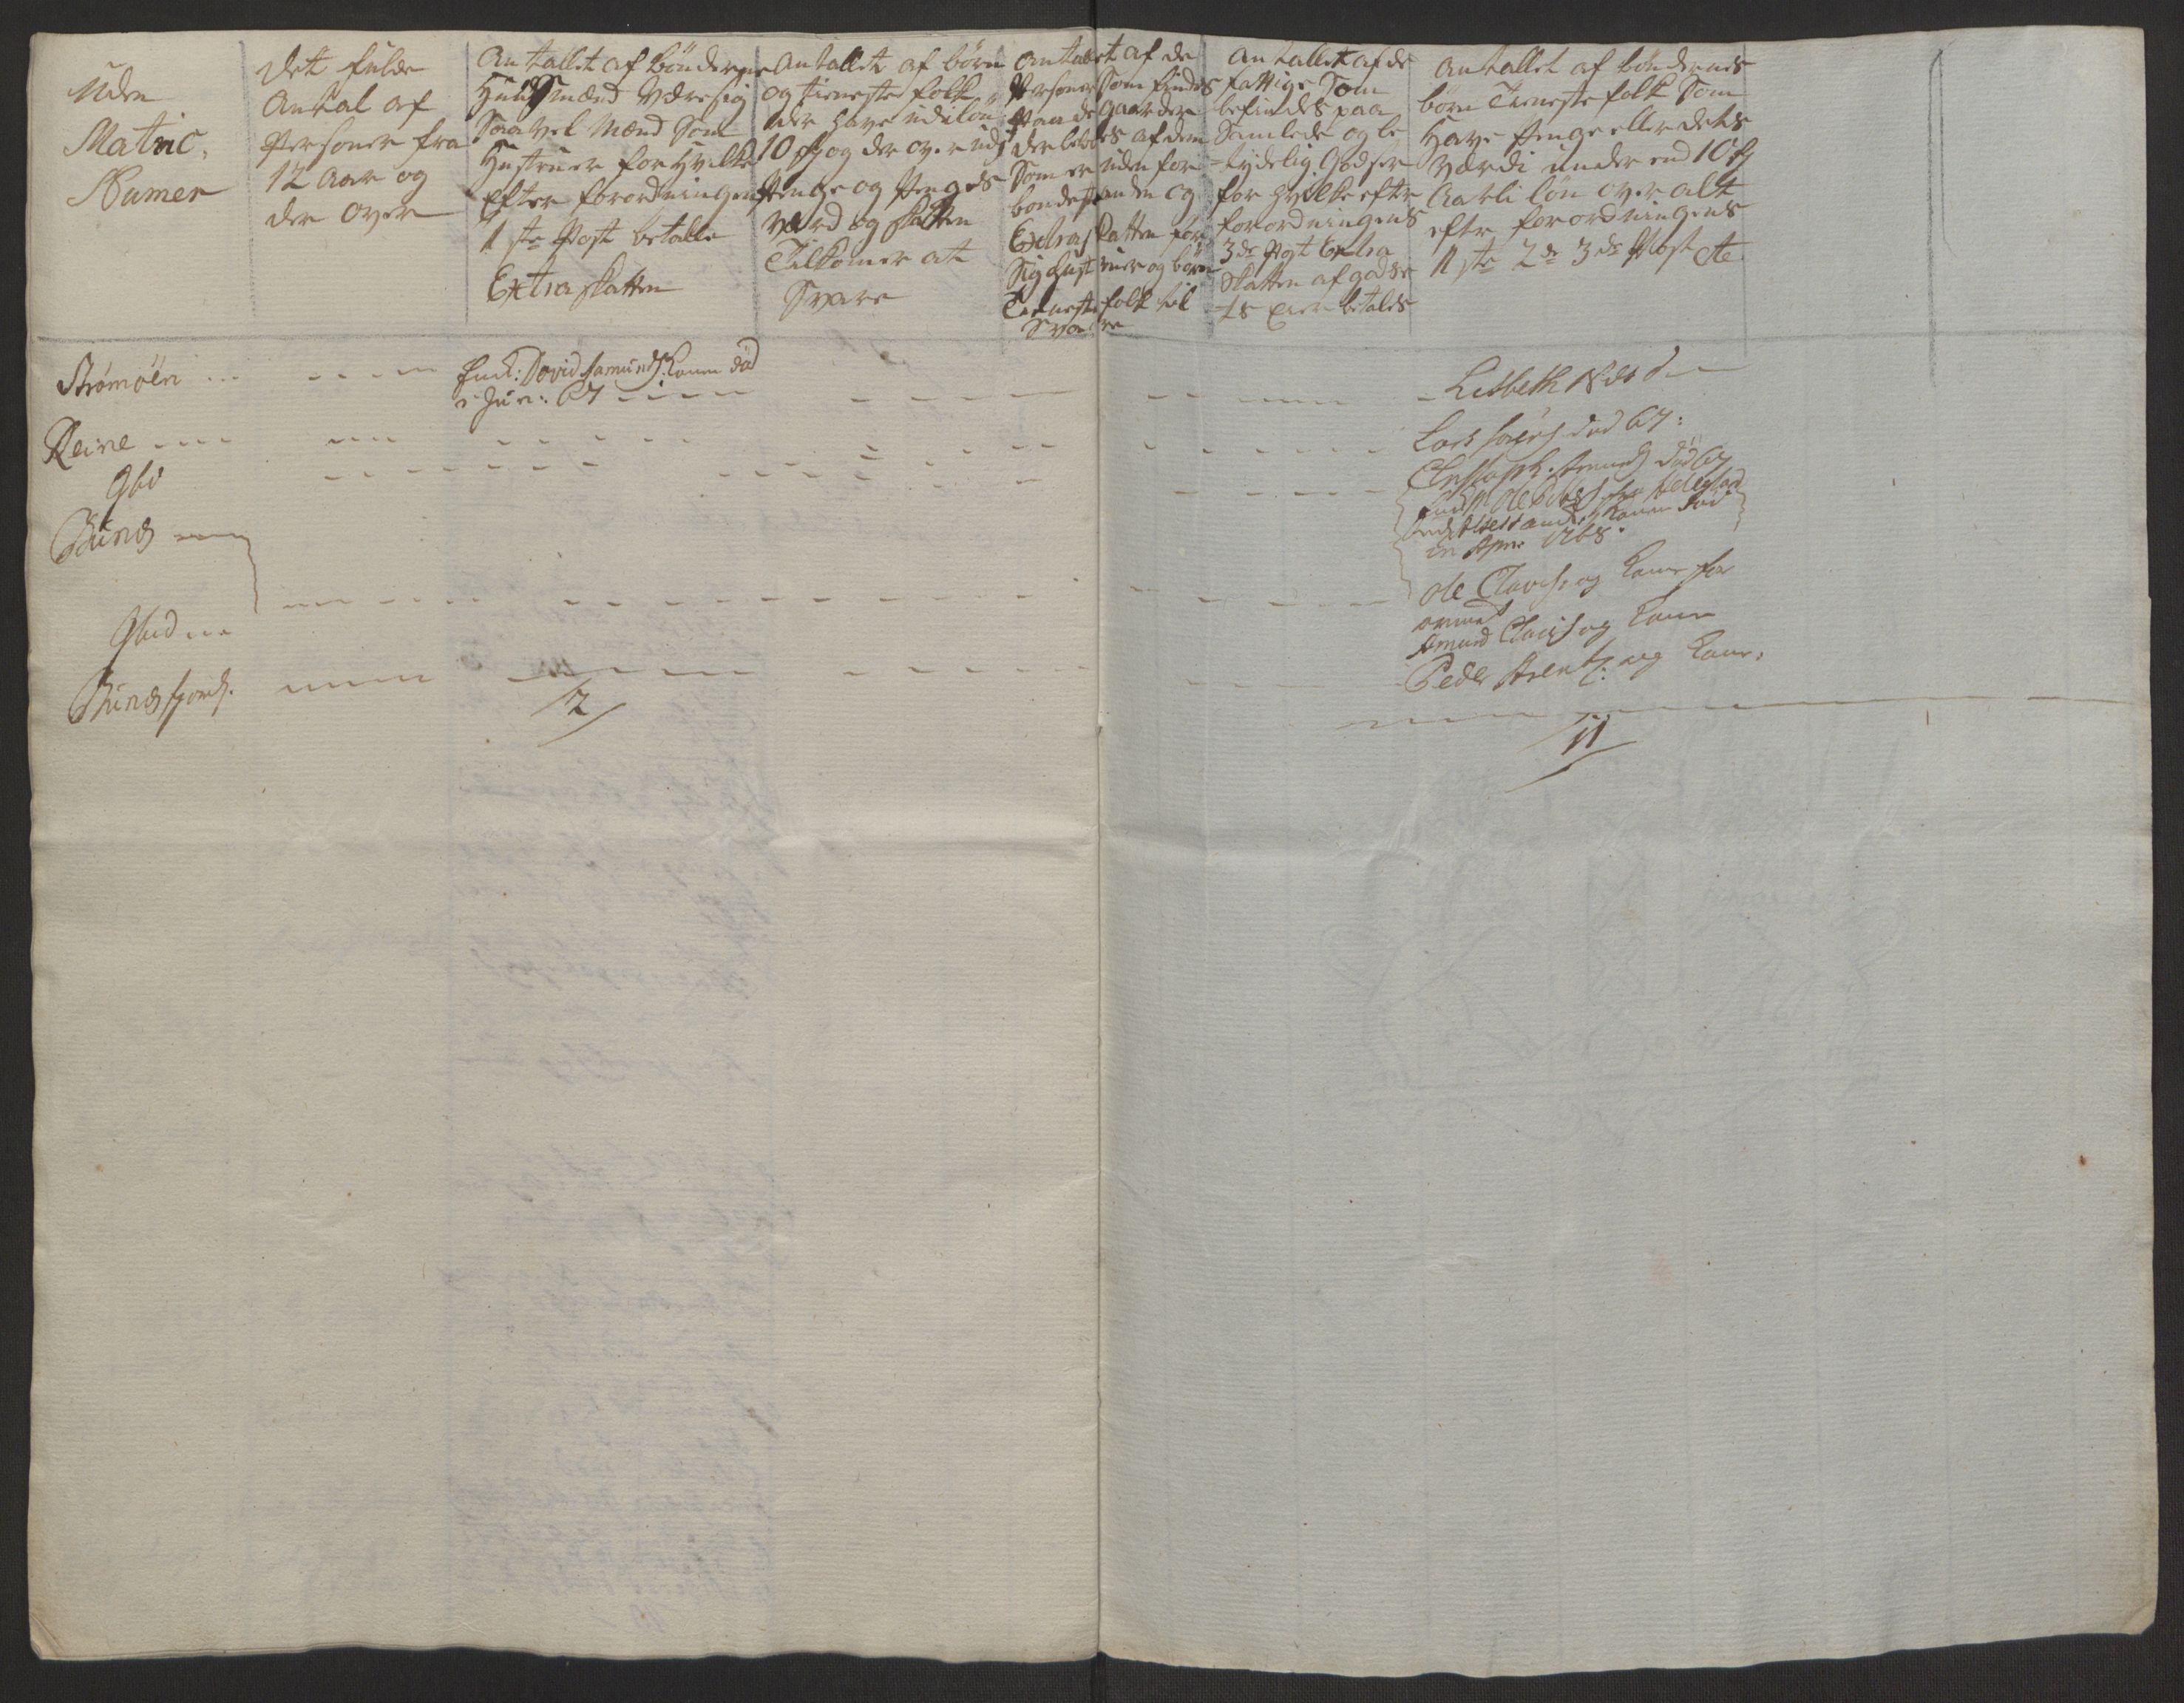 RA, Rentekammeret inntil 1814, Realistisk ordnet avdeling, Ol/L0022a: [Gg 10]: Ekstraskatten, 23.09.1762. Nordlands amt, 1763-1769, s. 335